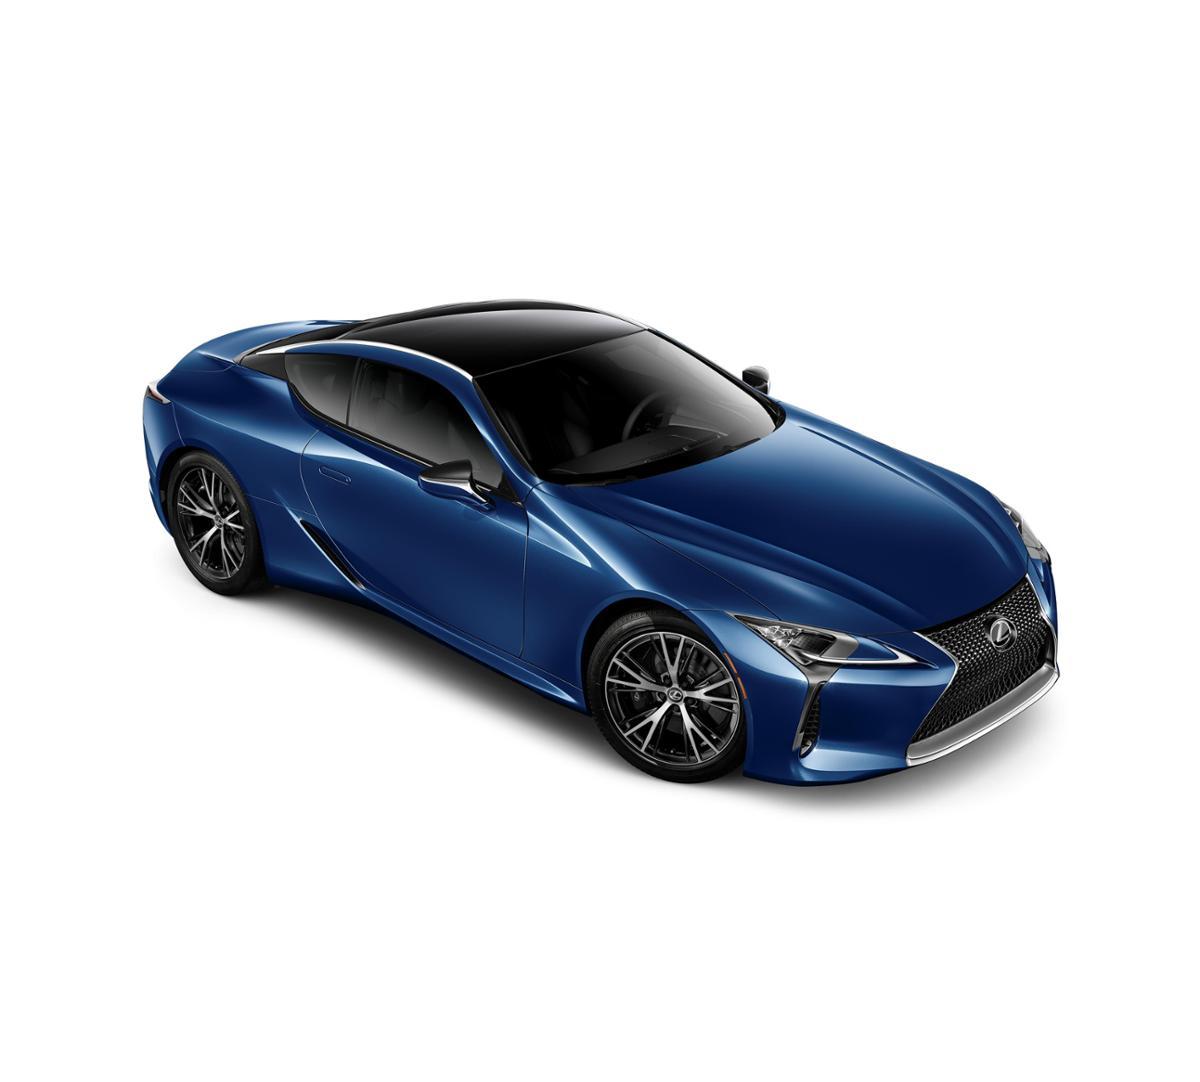 2019 Lexus LC 500 52028